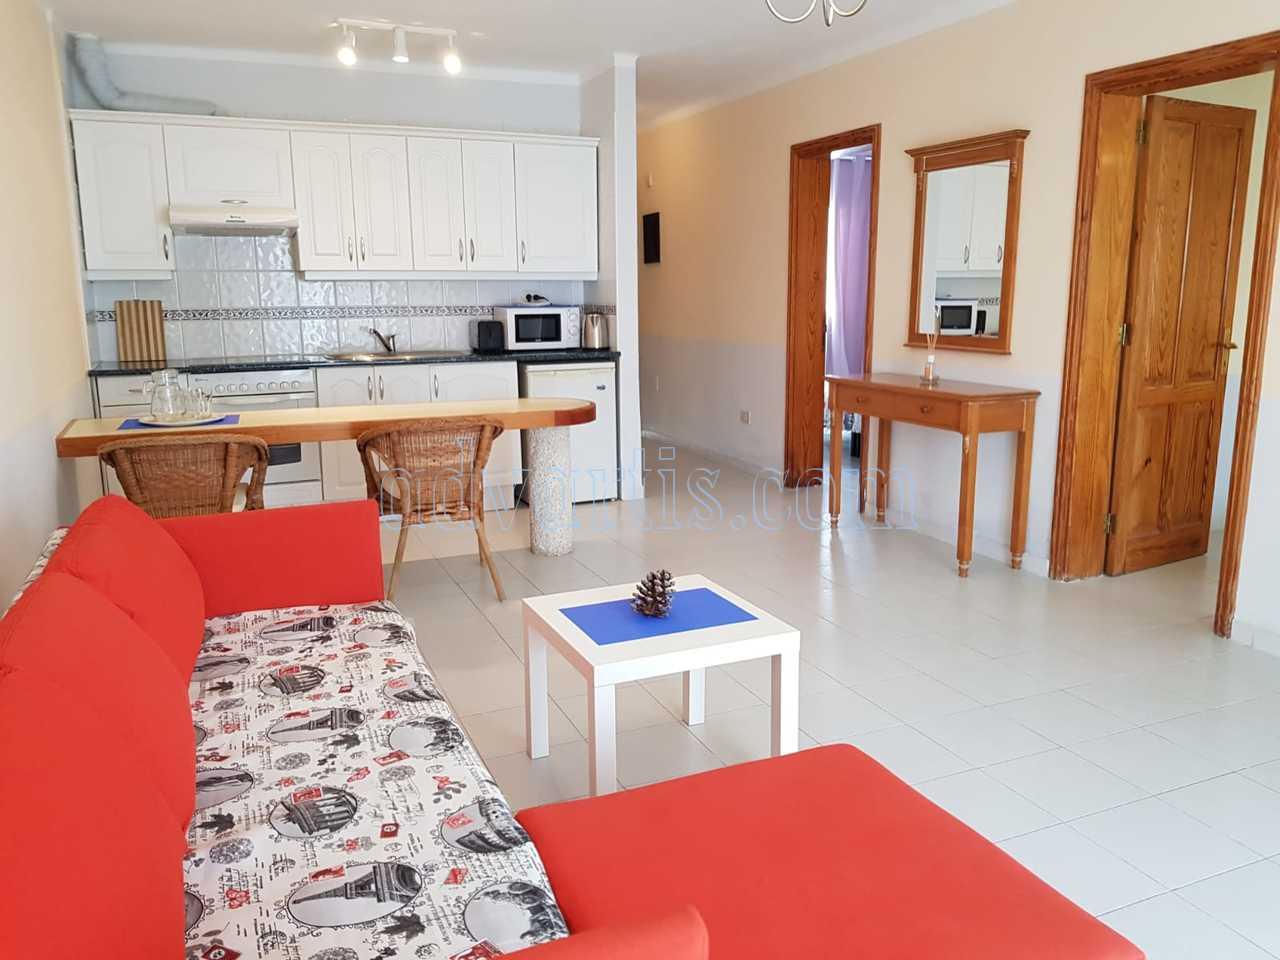 2 bedroom apartments for sale in Golf del Sur Tenerife € ...